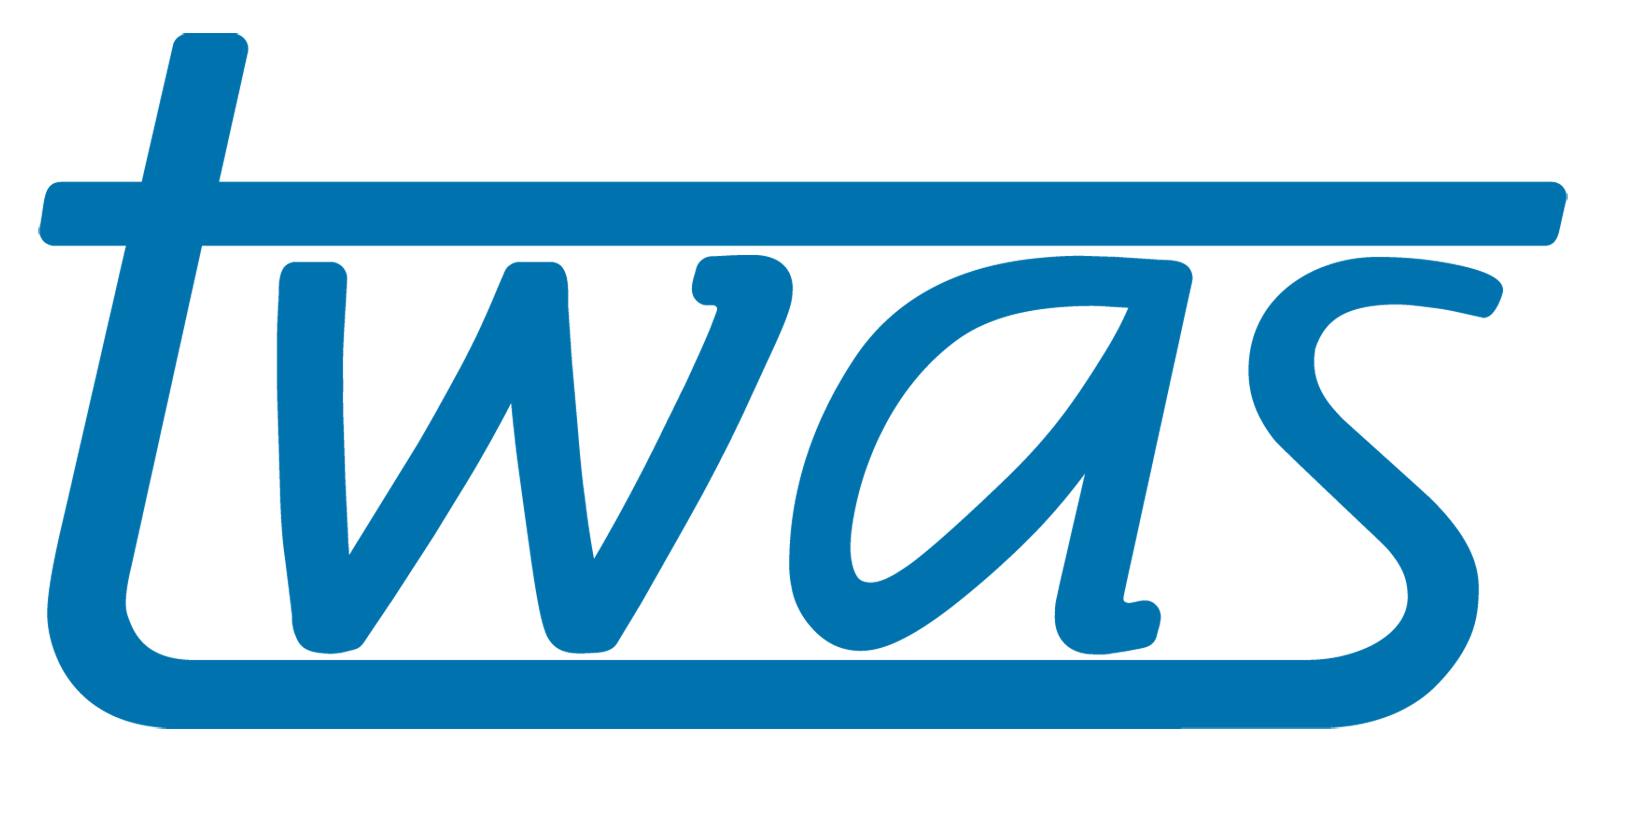 TWAS-CSIR Postdoctoral Fellowship Program 2019/2020 for Researchers from Establishing Nations (Moneyed)